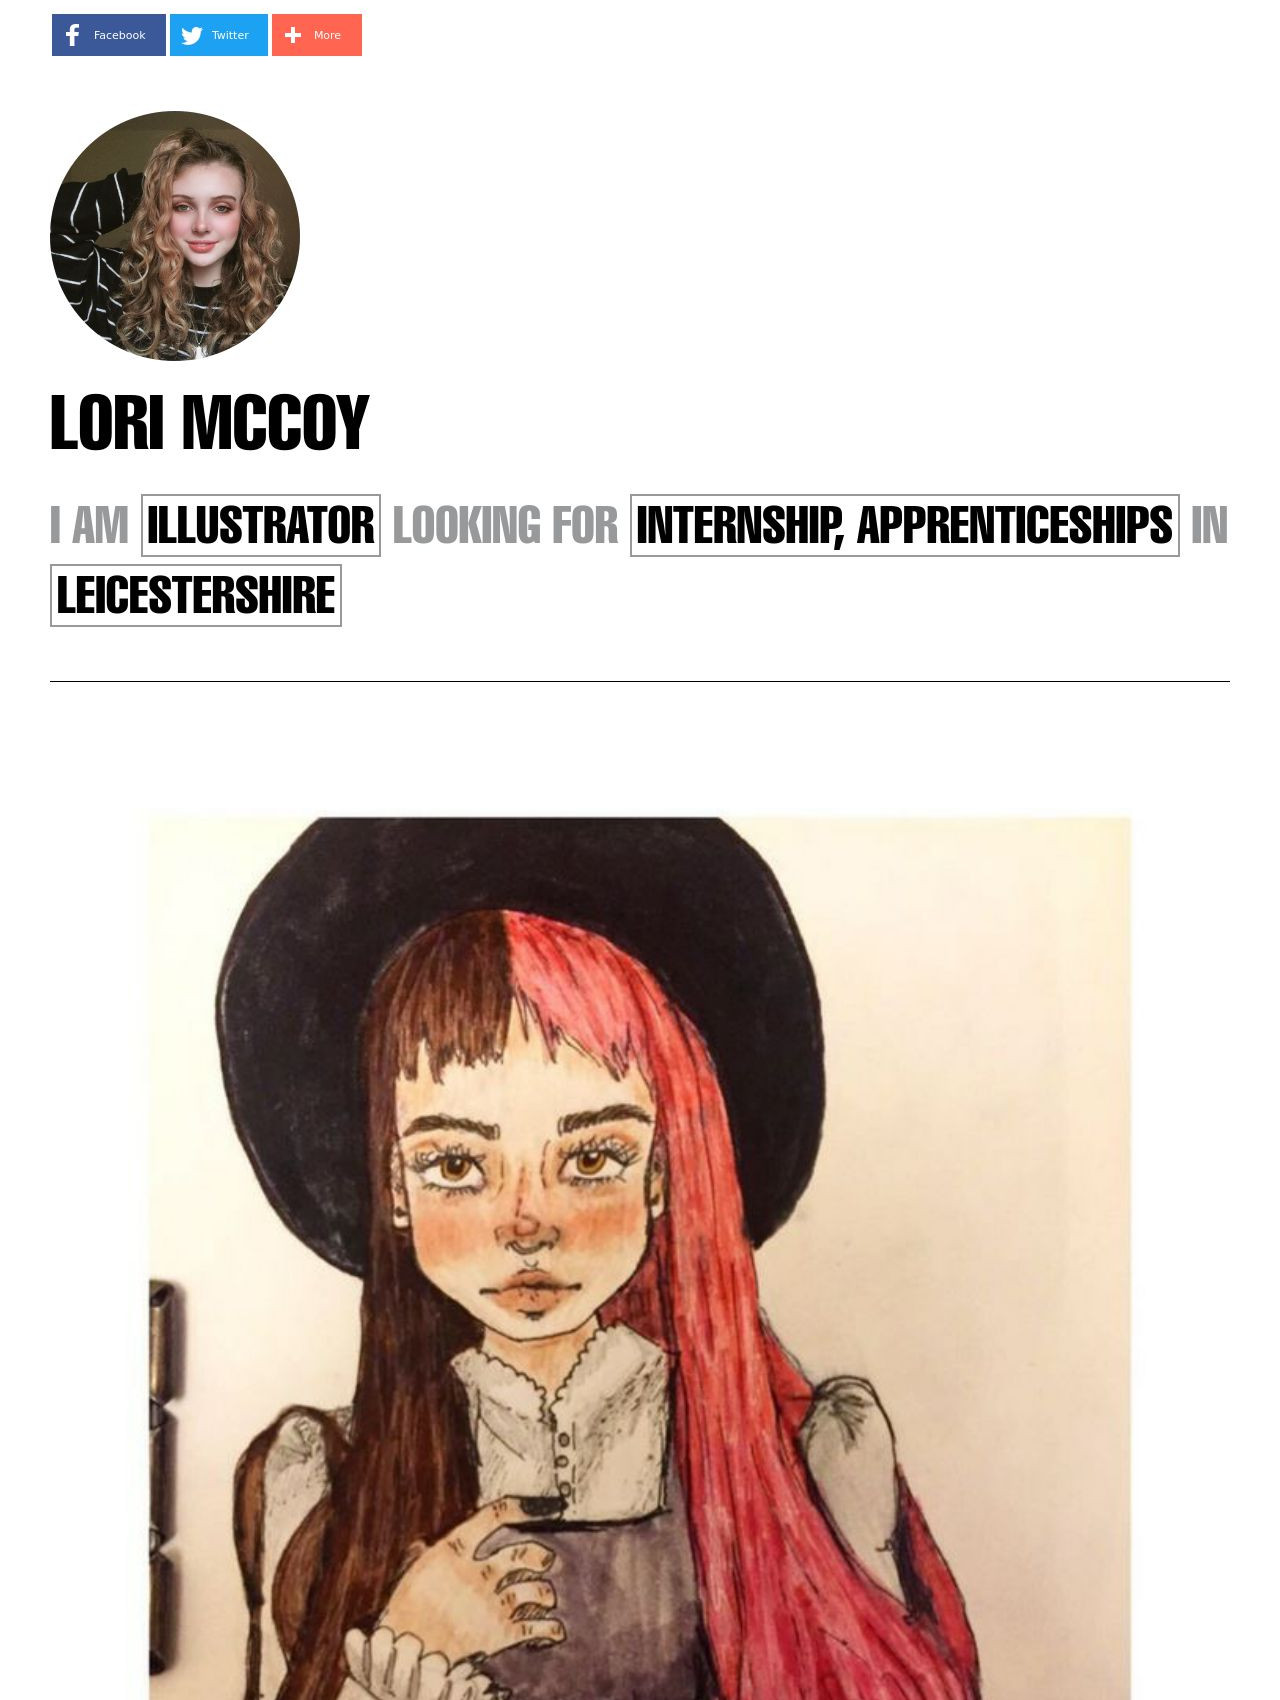 Lori McCoy